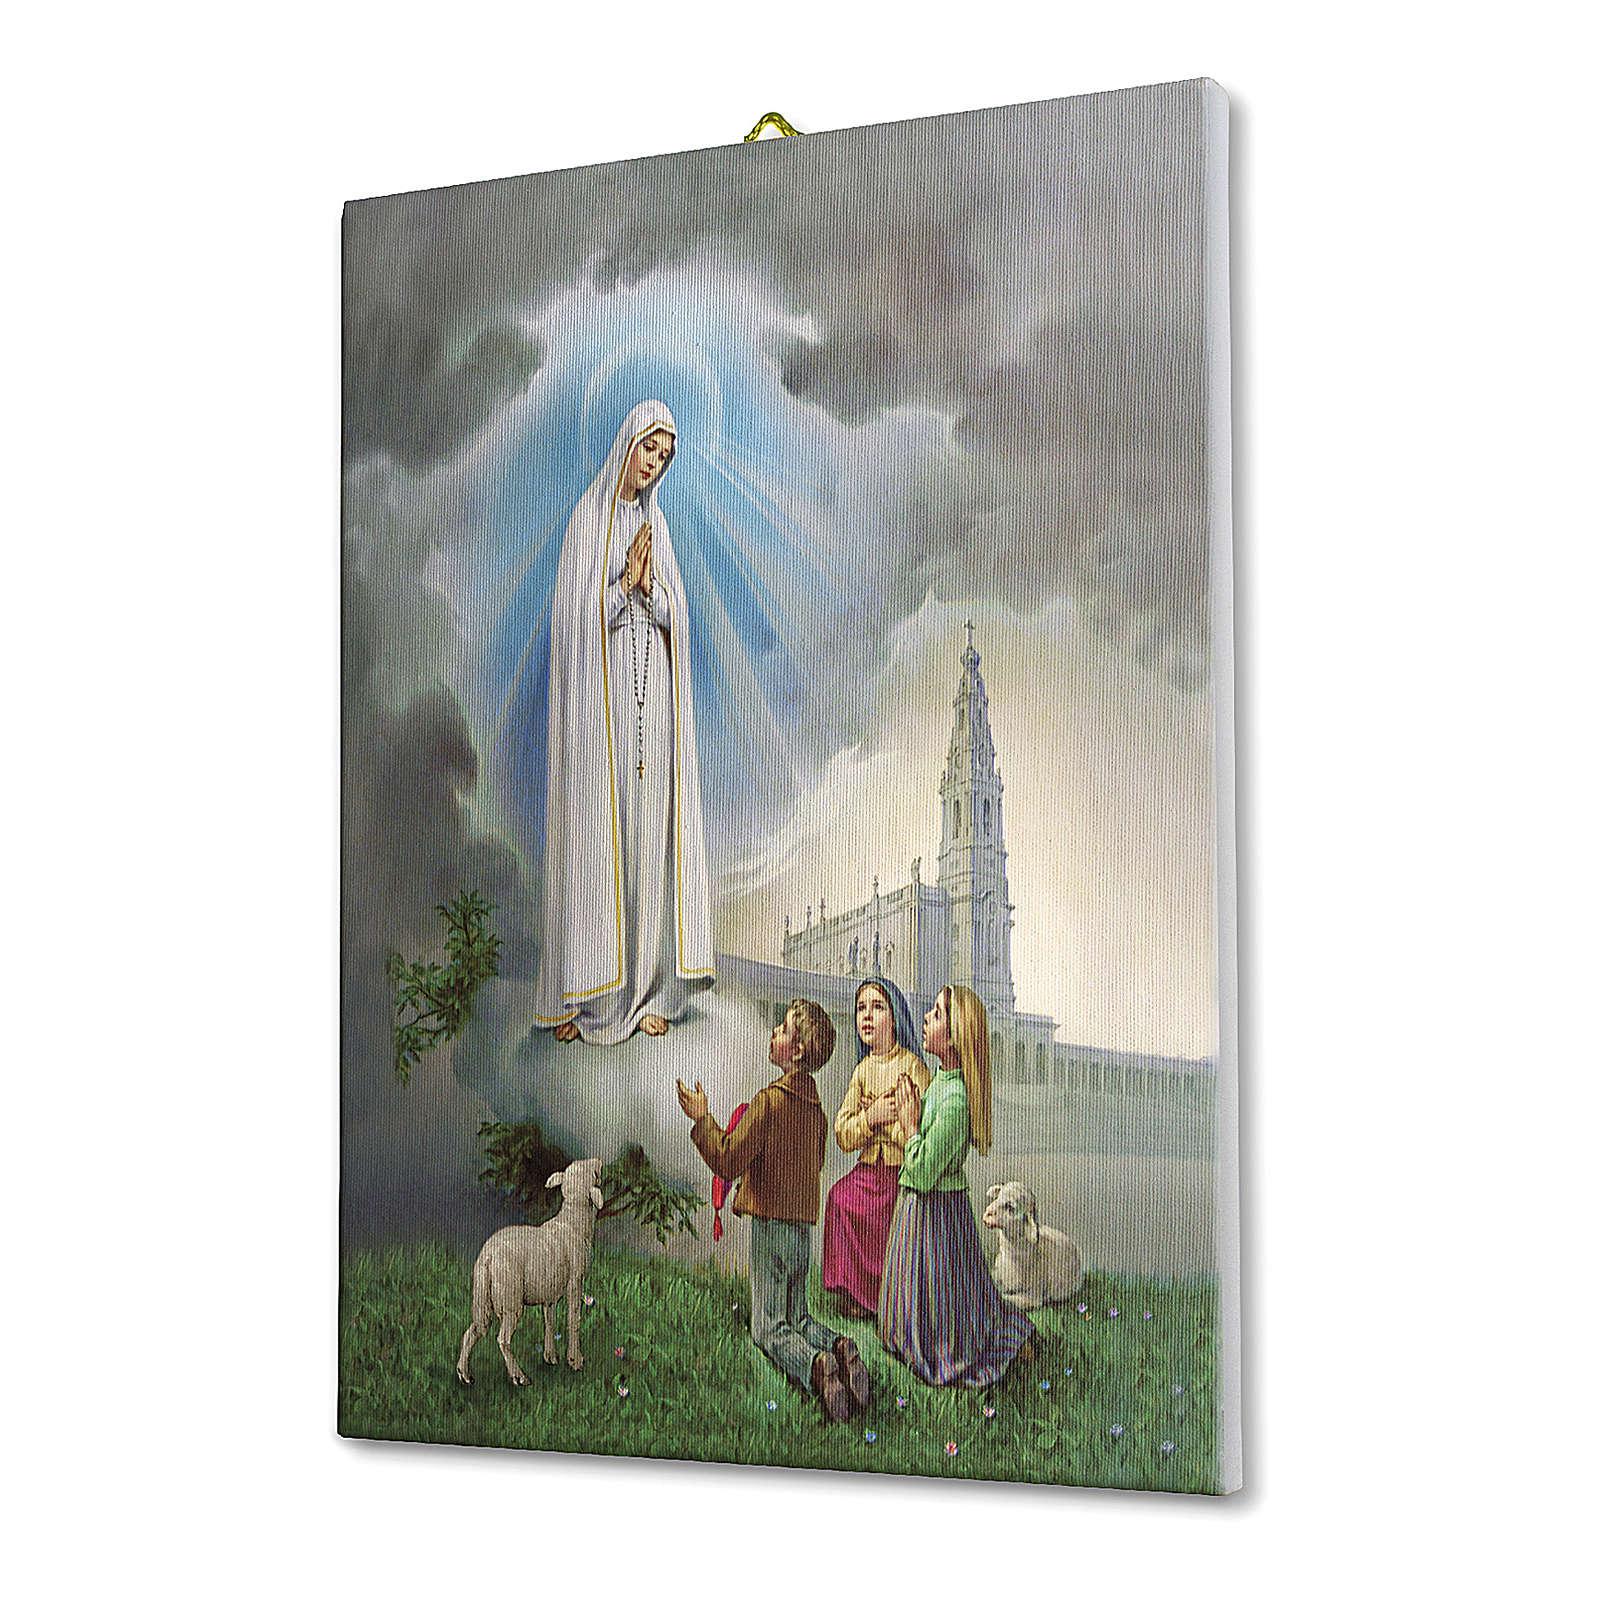 Apparition at print on canvas print 40x30 cm 3